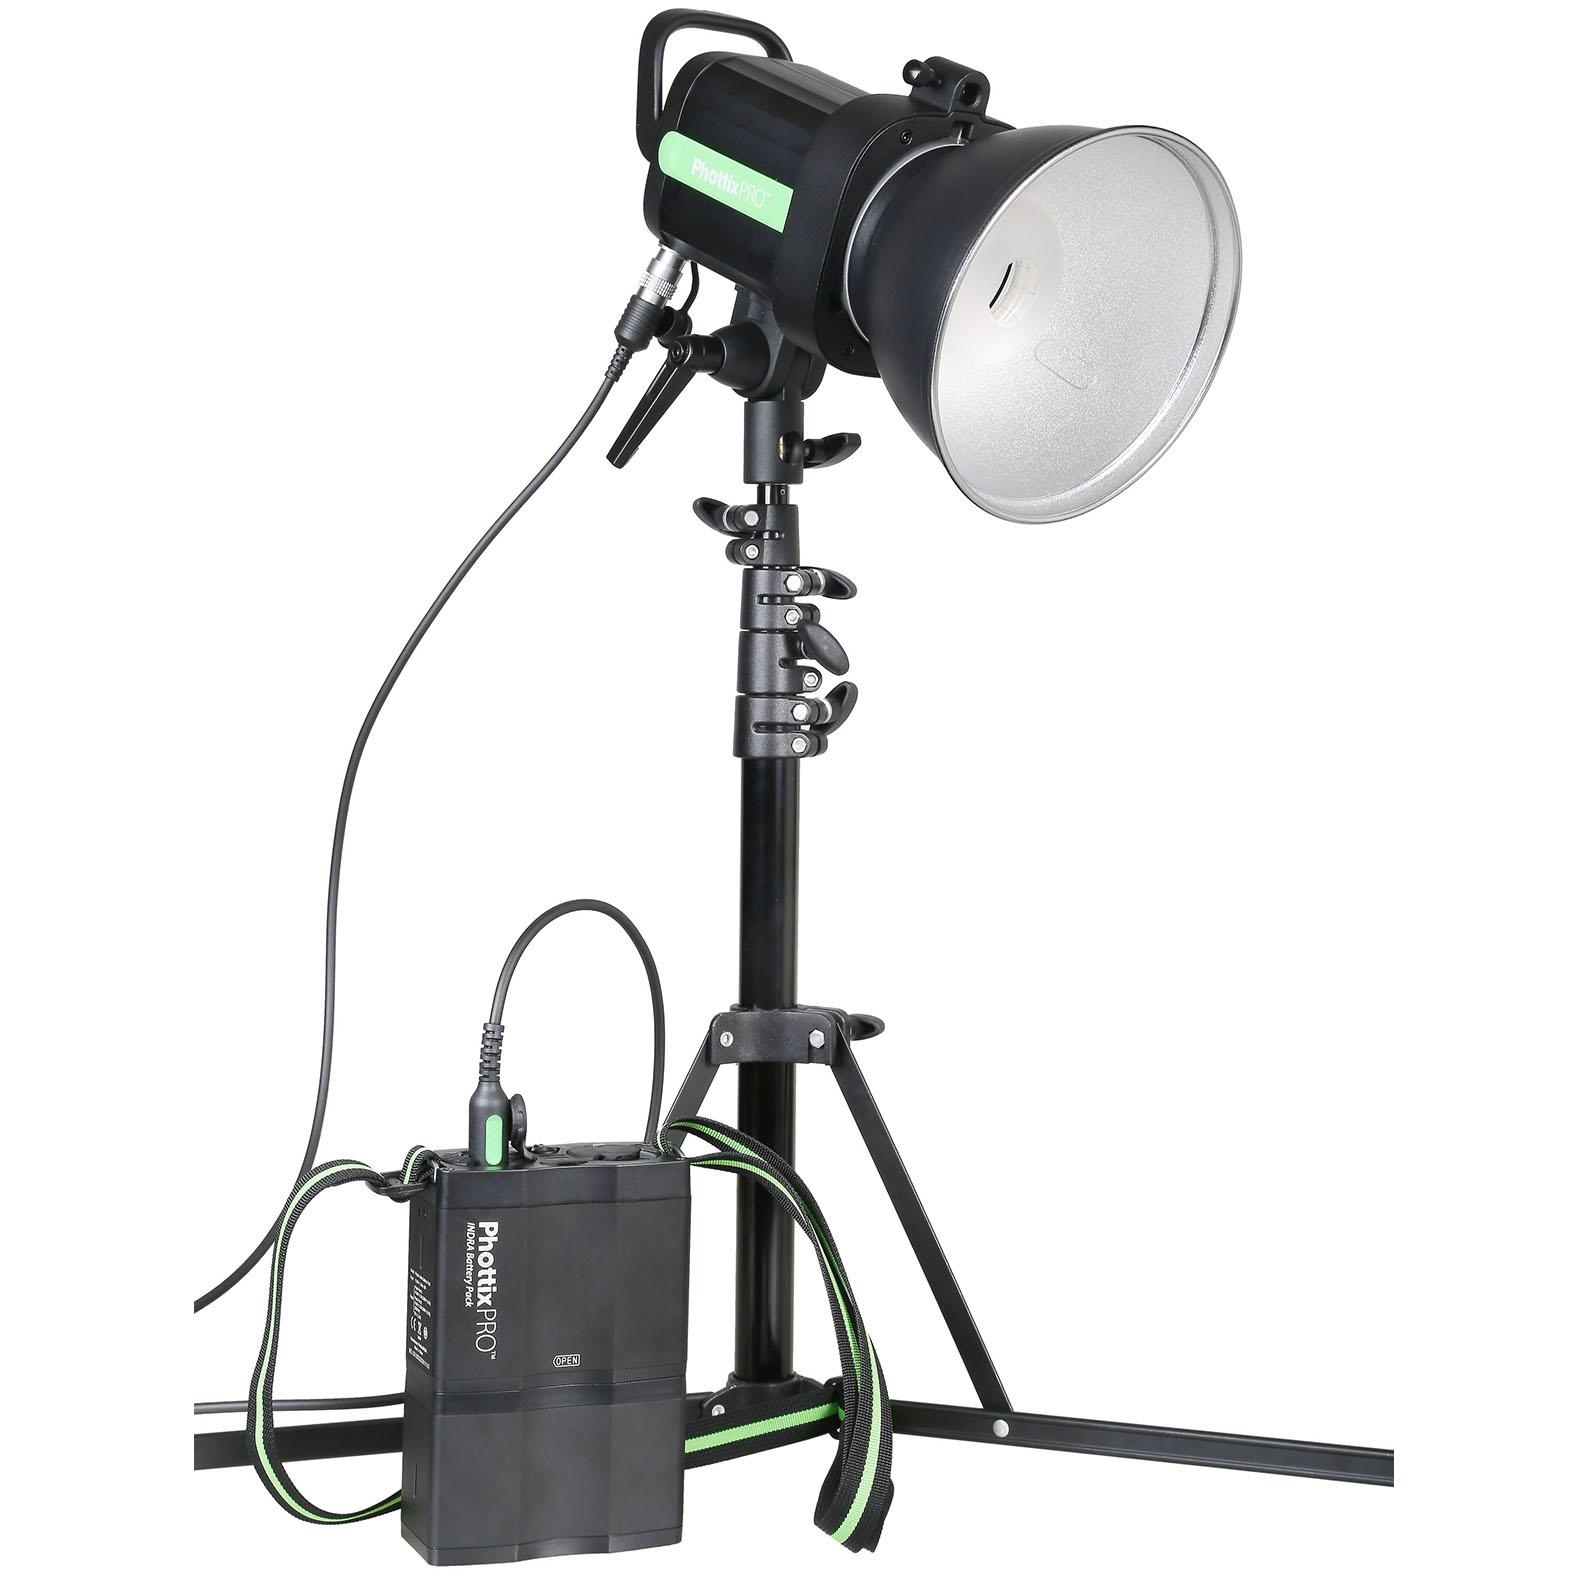 Phottix Indra500 TTL Studio Light with Battery Pack Kit